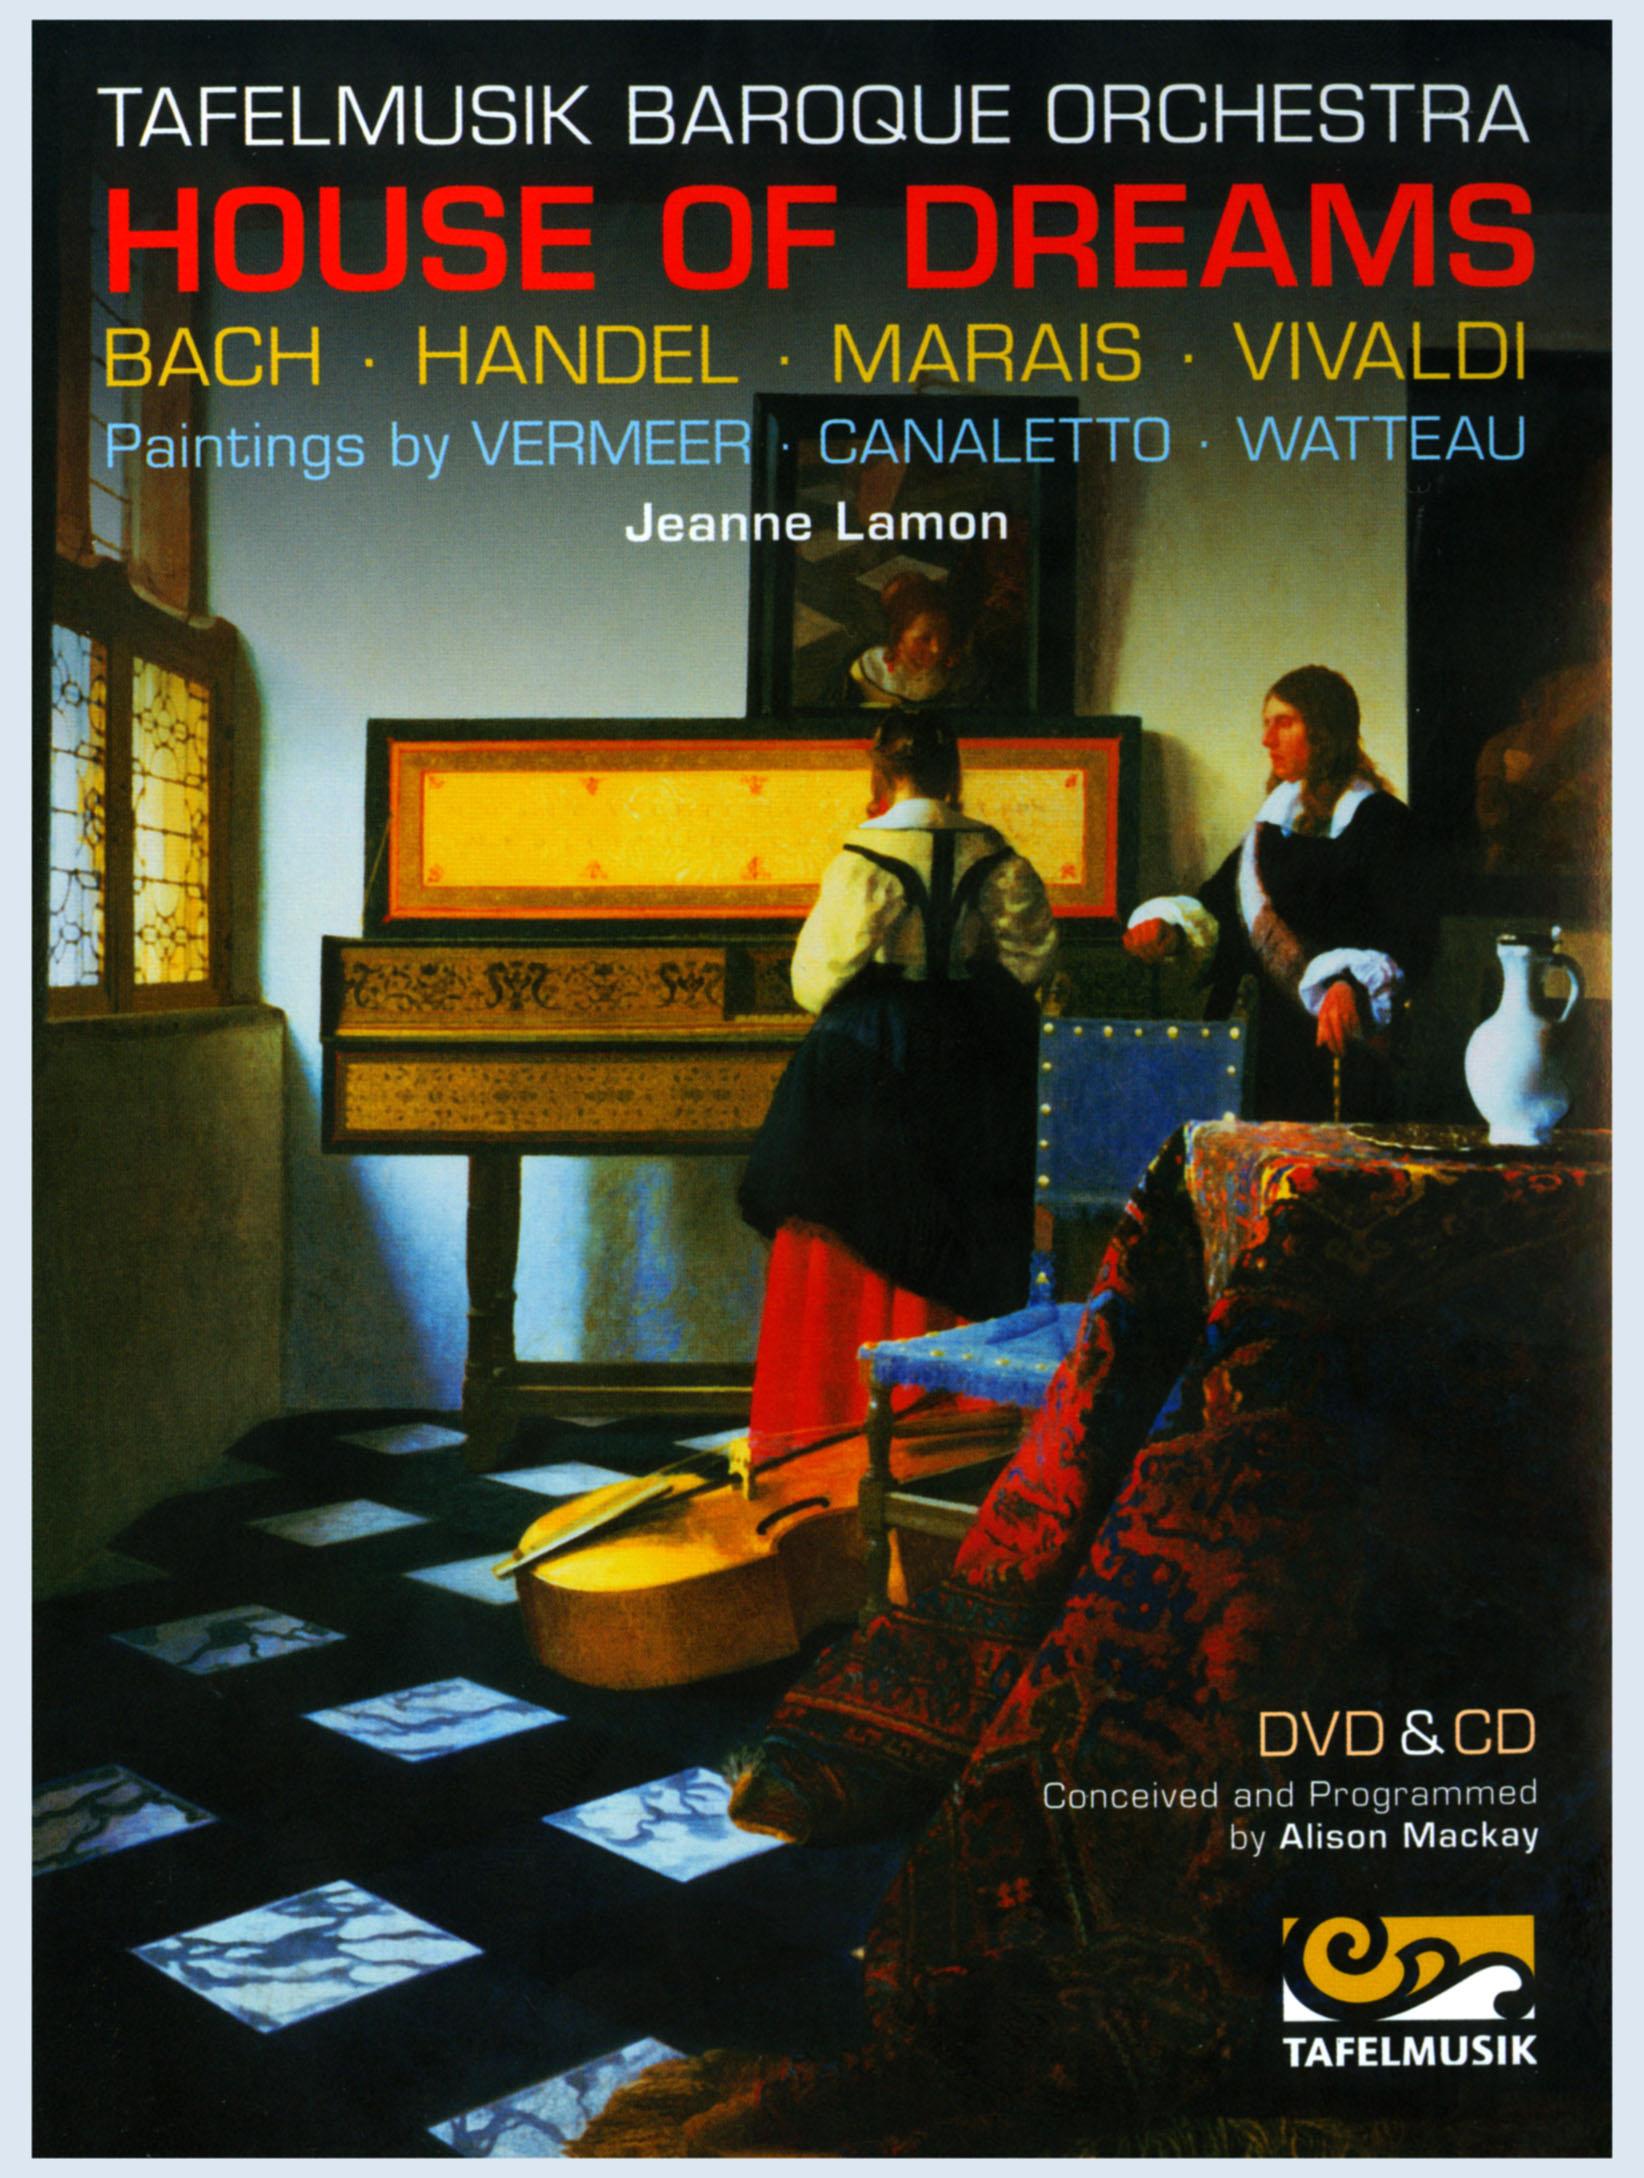 Tafelmusik Baroque Orchestra: House of Dreams